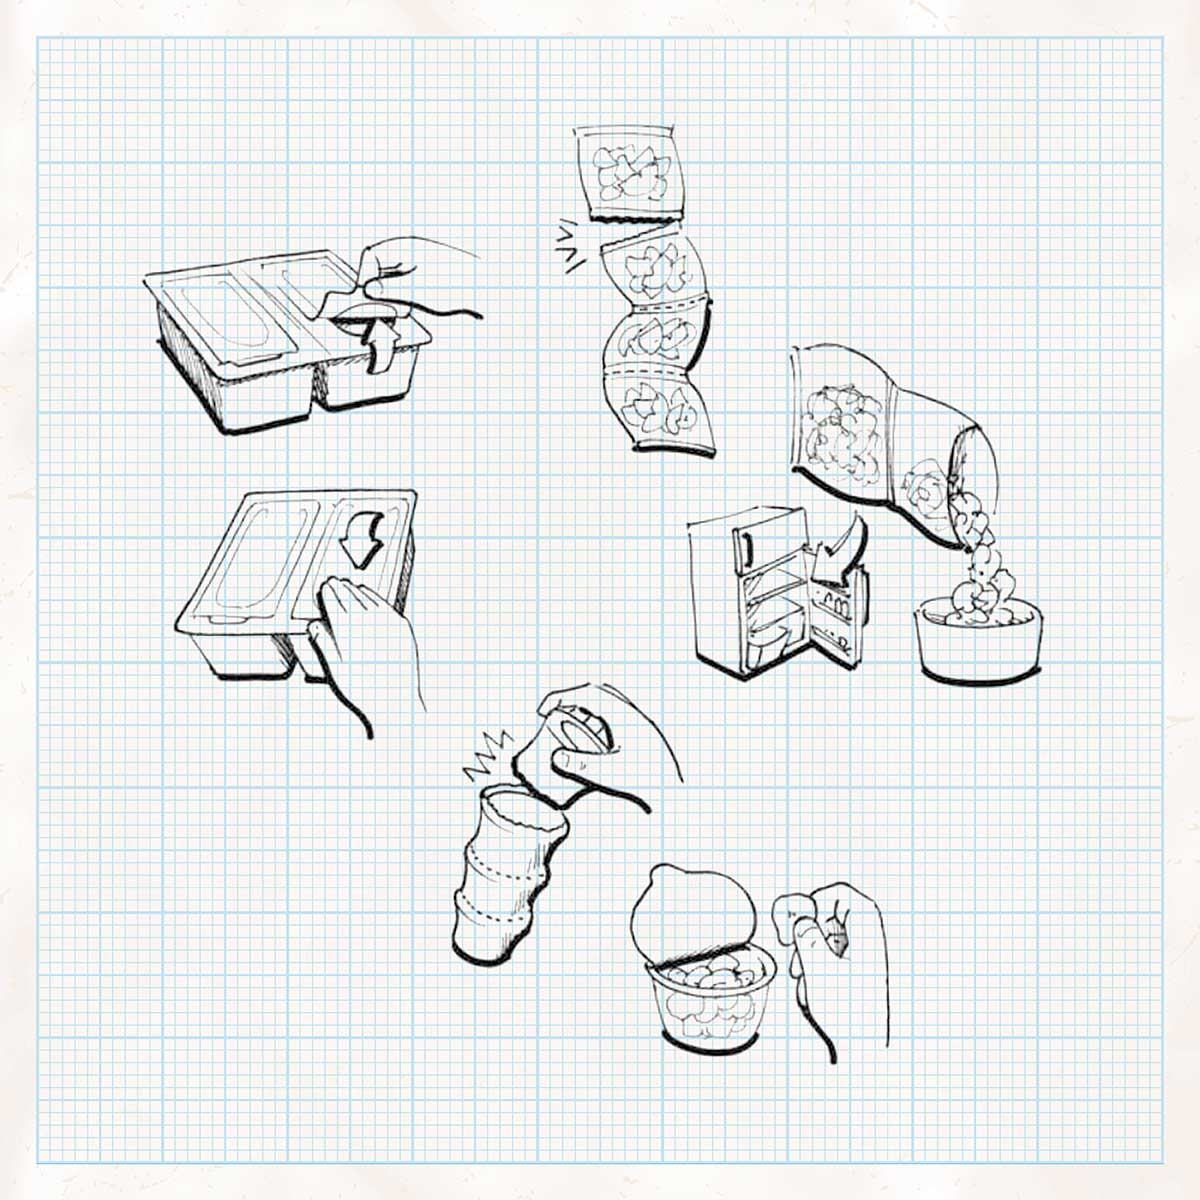 various packaging illustrations